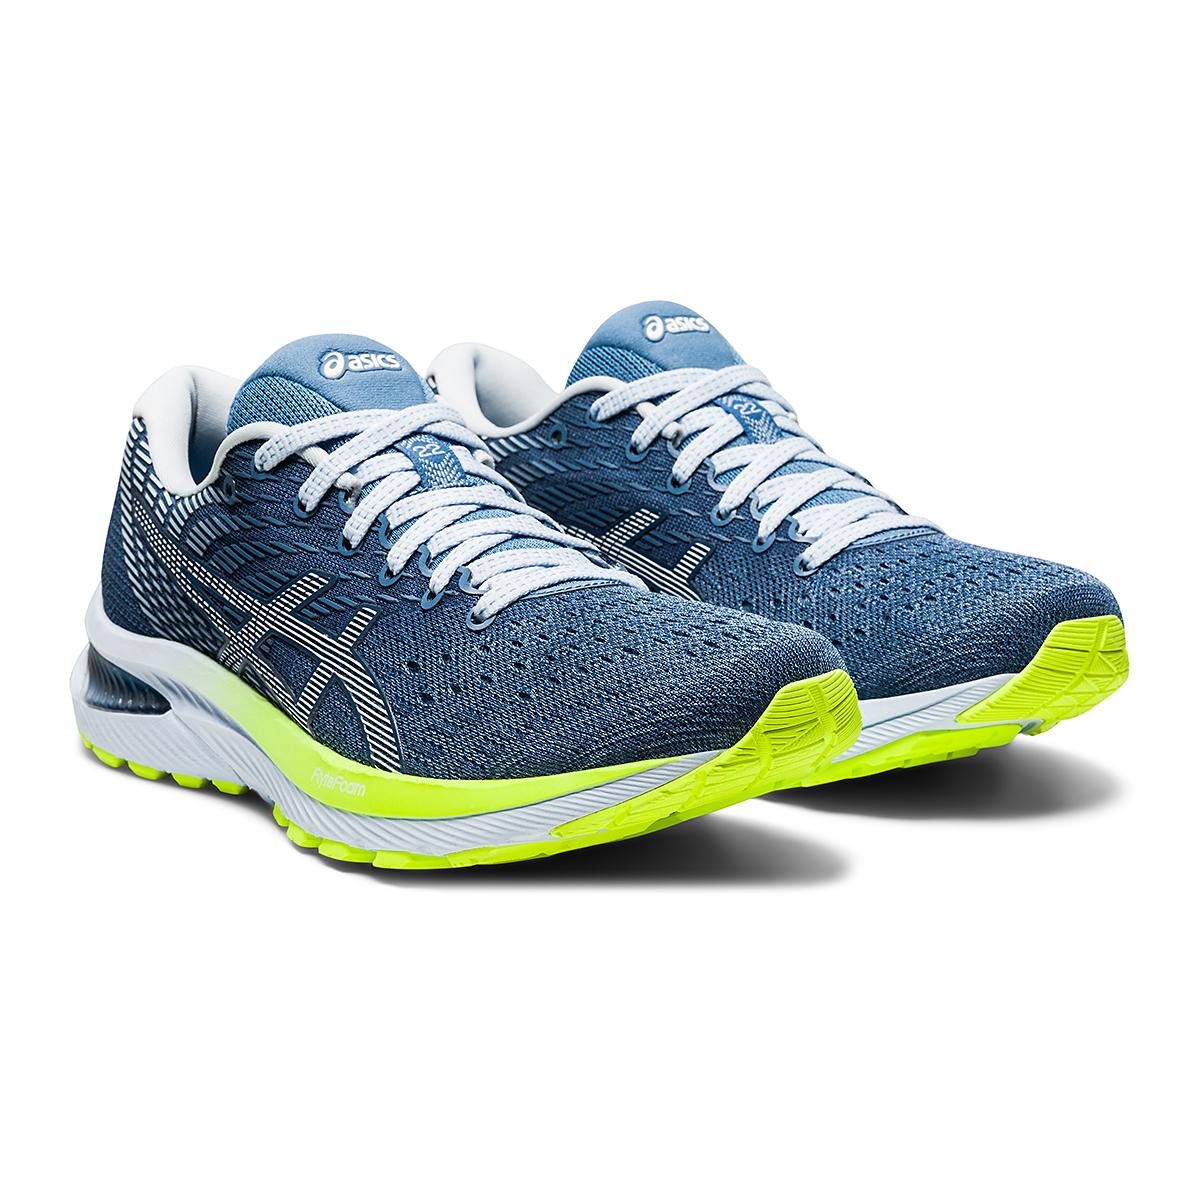 Women's Asics GEL-Cumulus 22 Running Shoe - Color: Grey Floss/White - Size: 6 - Width: Regular, Grey Floss/White, large, image 3